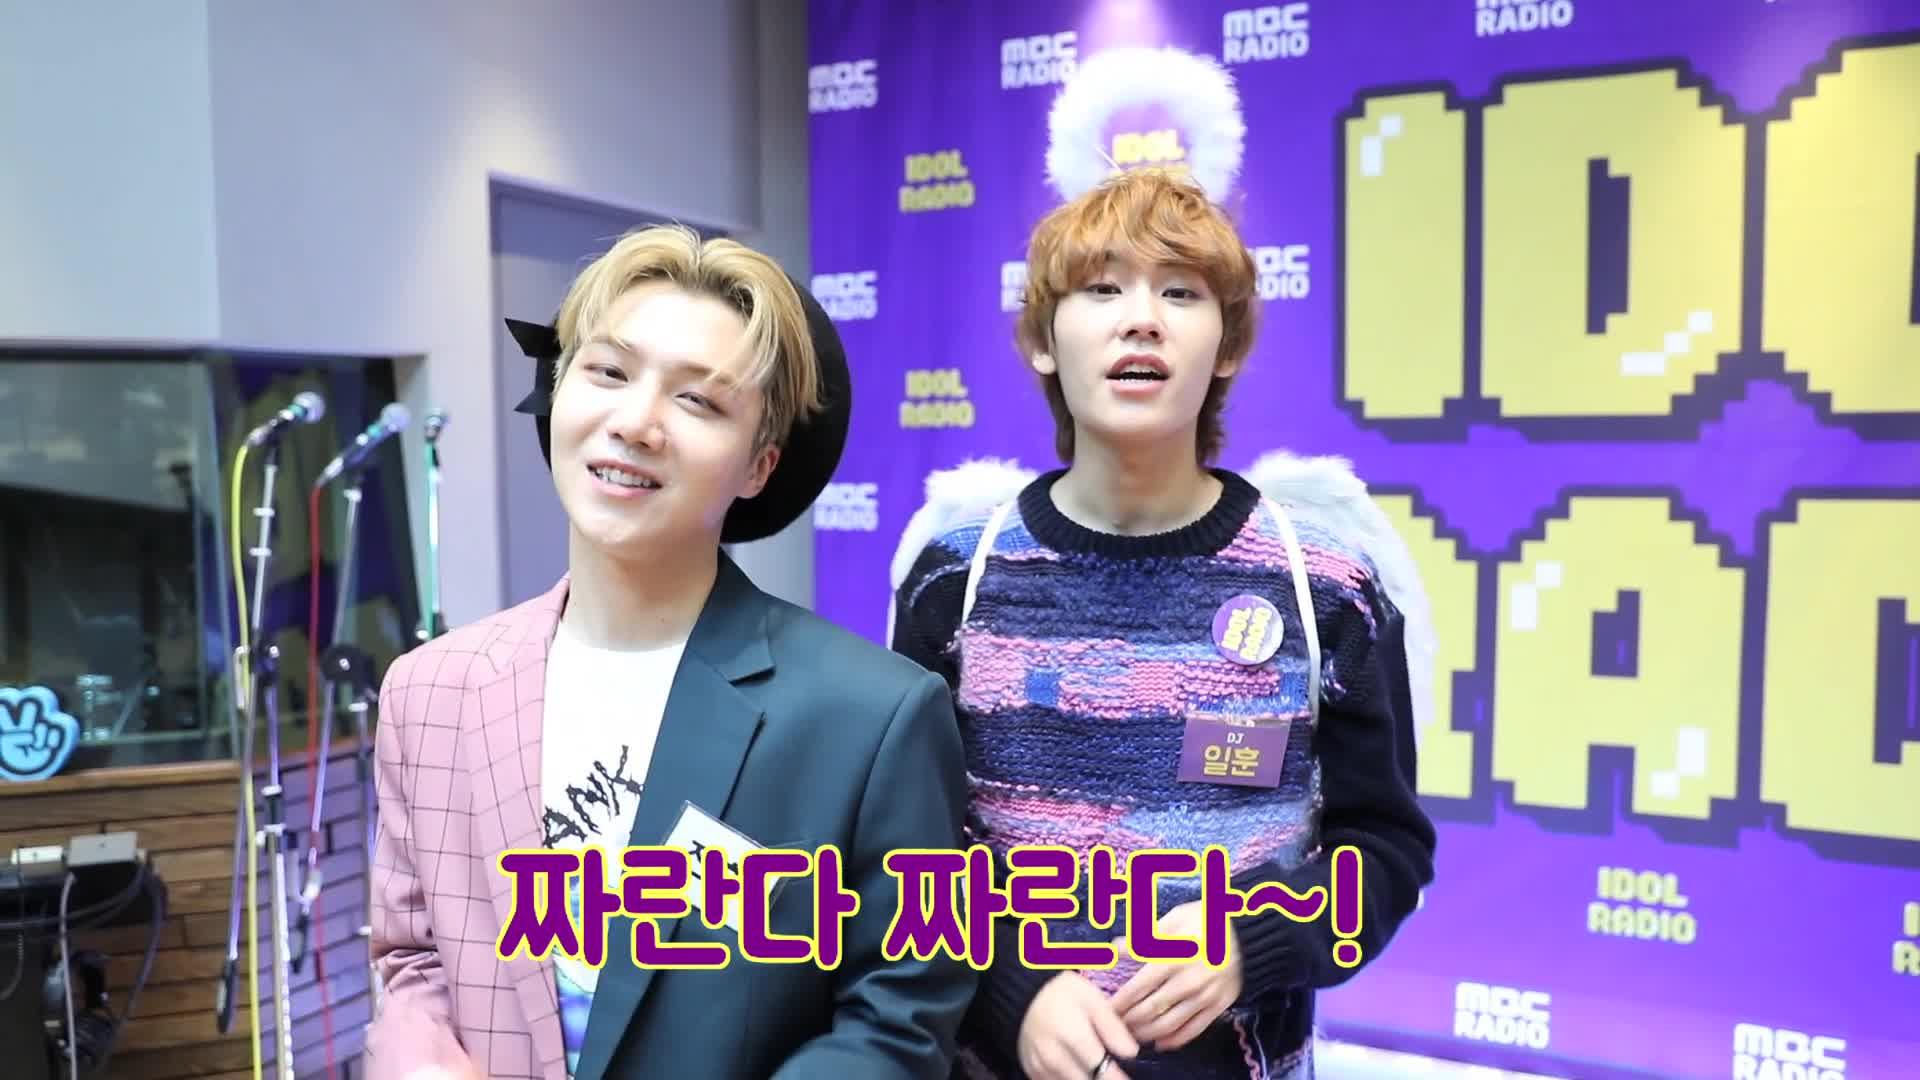 IDOL RADIO ep 8 / Behind 짜란다짜란다~ 'ALWAYS'라이브! 정일훈 feat. 진호 of 펜타곤